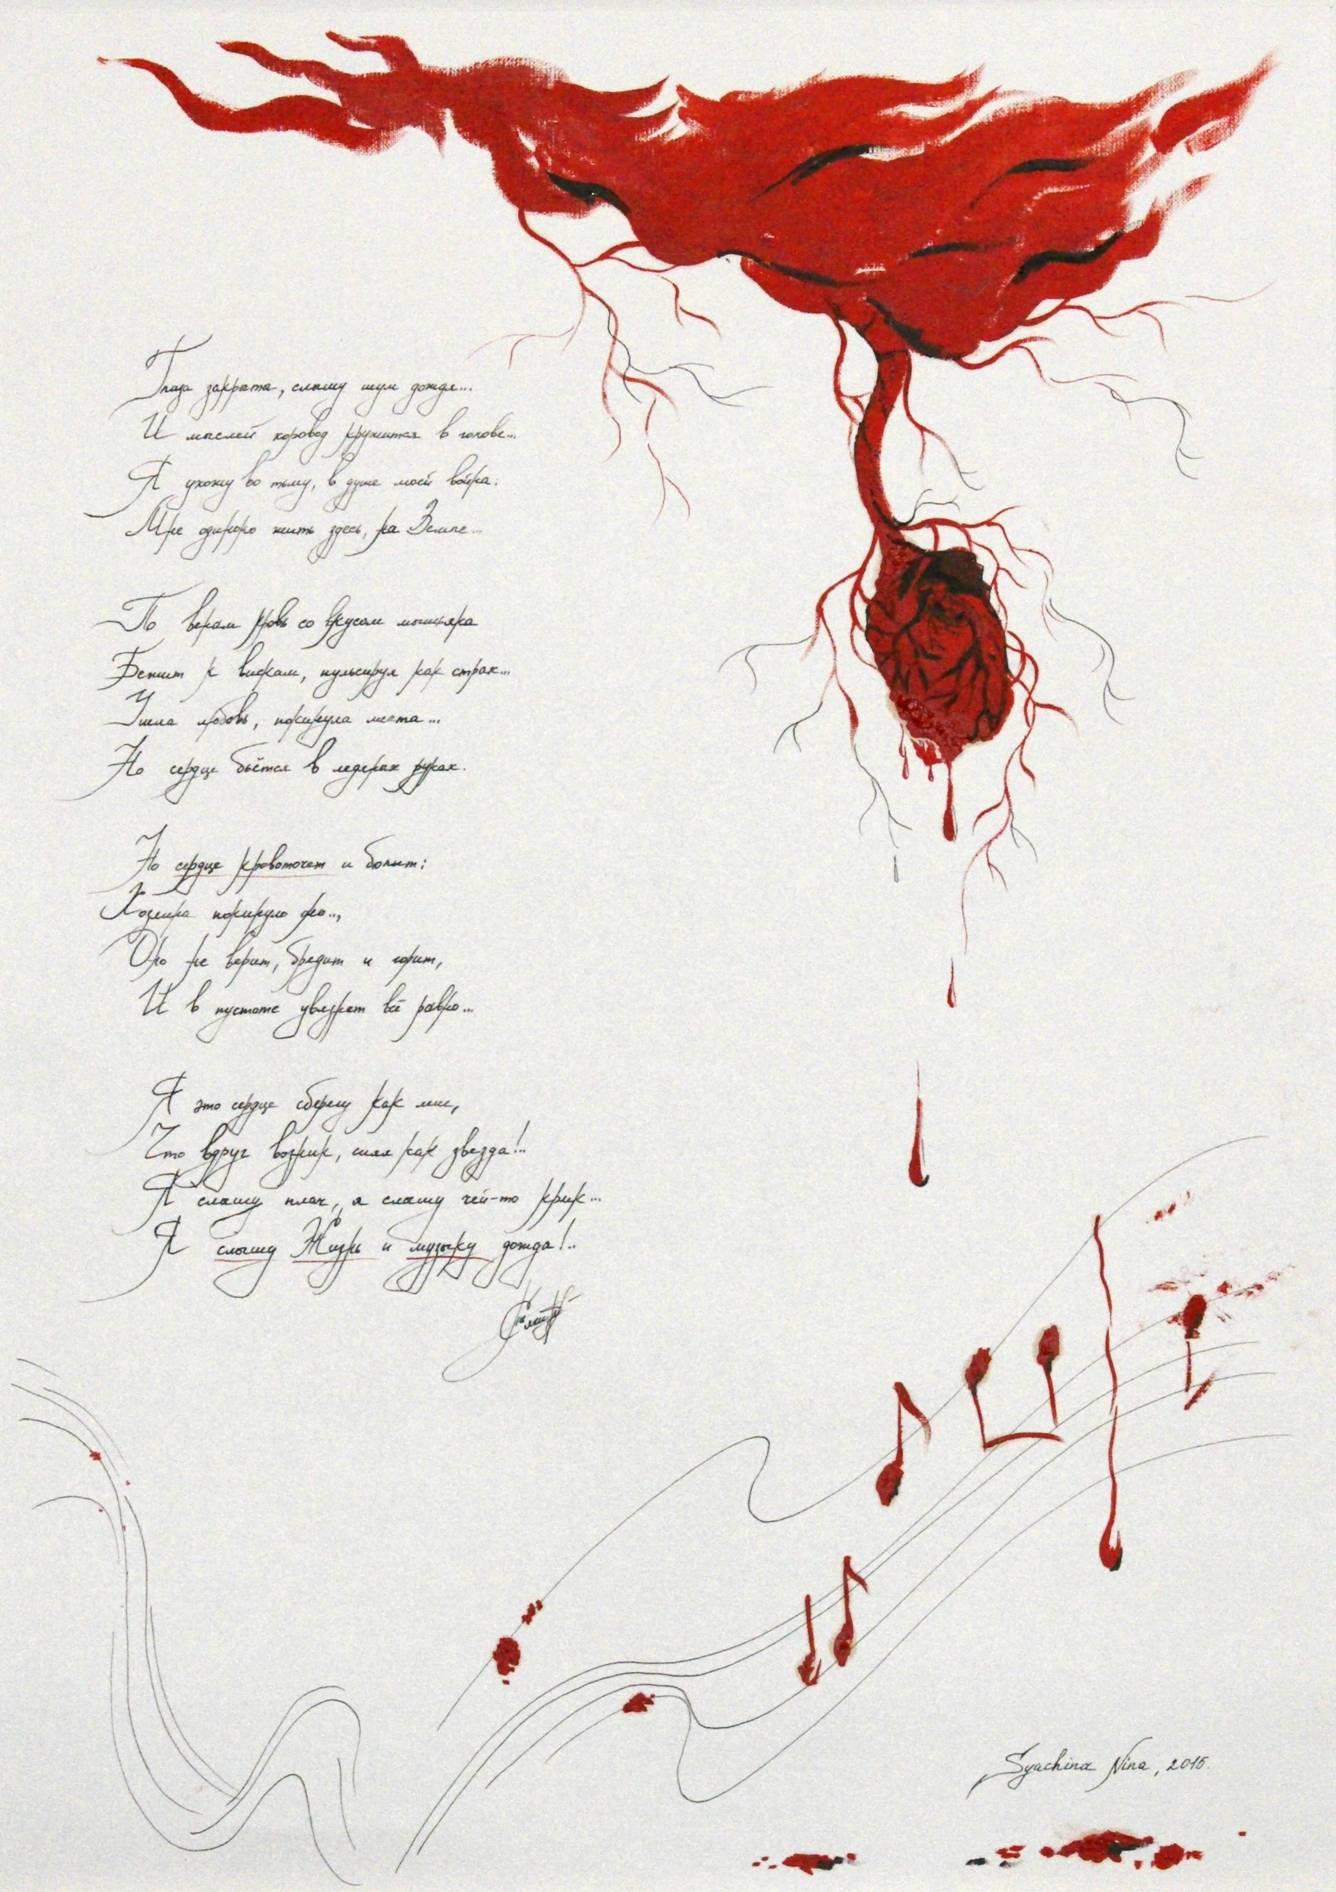 """Музыка Жизни"". ""Ритмика Жизни"". 2015год. Графика, живопись маслом. Масло, бумага, тушь, перо. 42х60 ""The Music of Life"". ""Rhythm of Life"". 2015god. Drawing, oil painting. Oil, paper, ink, pen. 42x60"